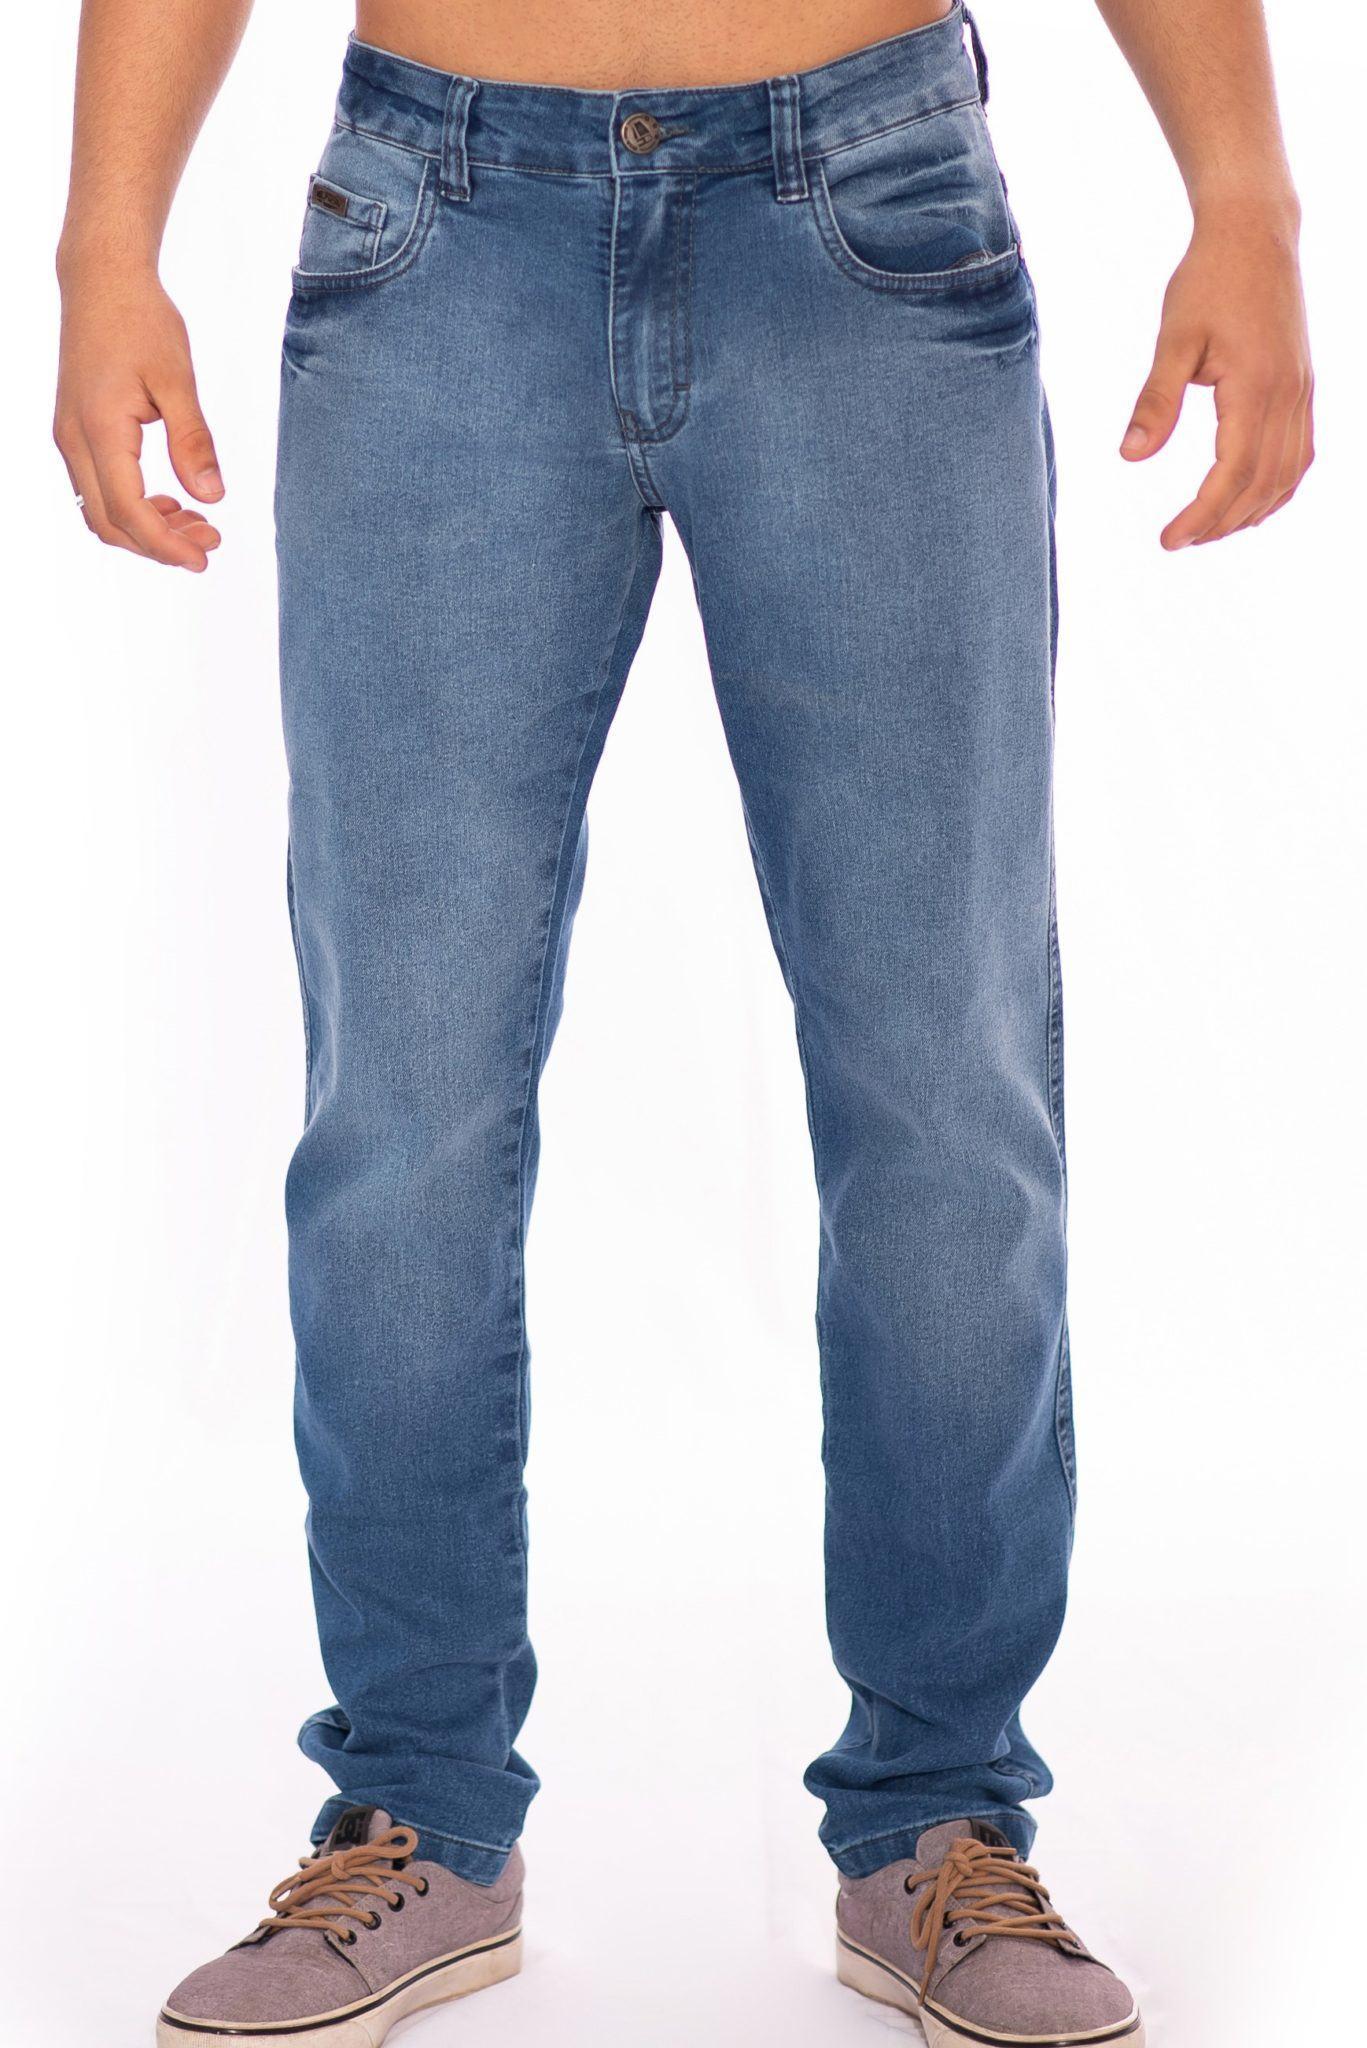 Calça Jeans Masculina Slim Aee Surf